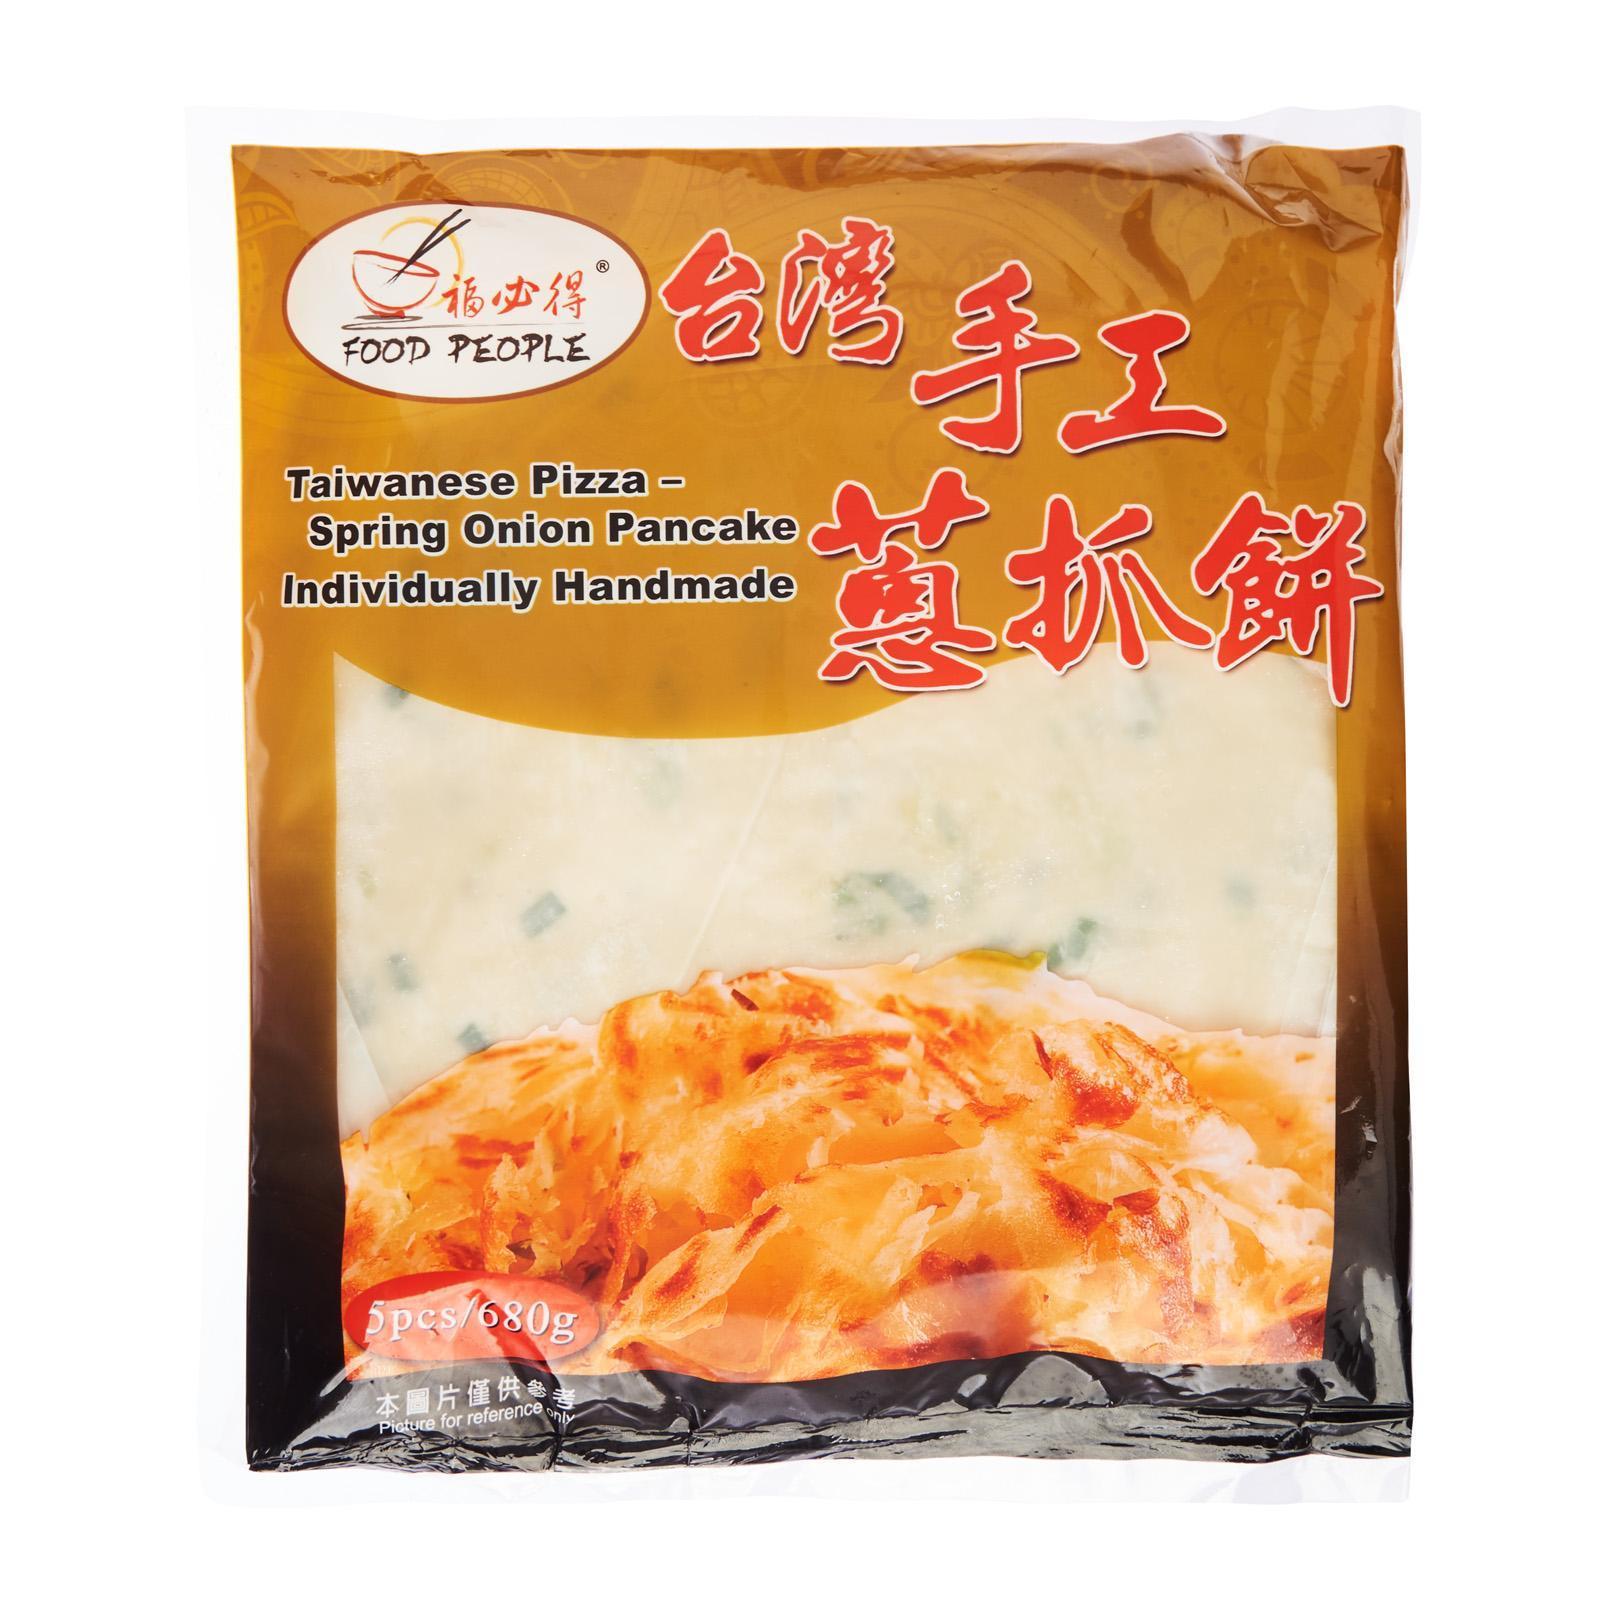 Food People Taiwan Handmade Spring Onion Scallion Pancake - By Food People - Frozen